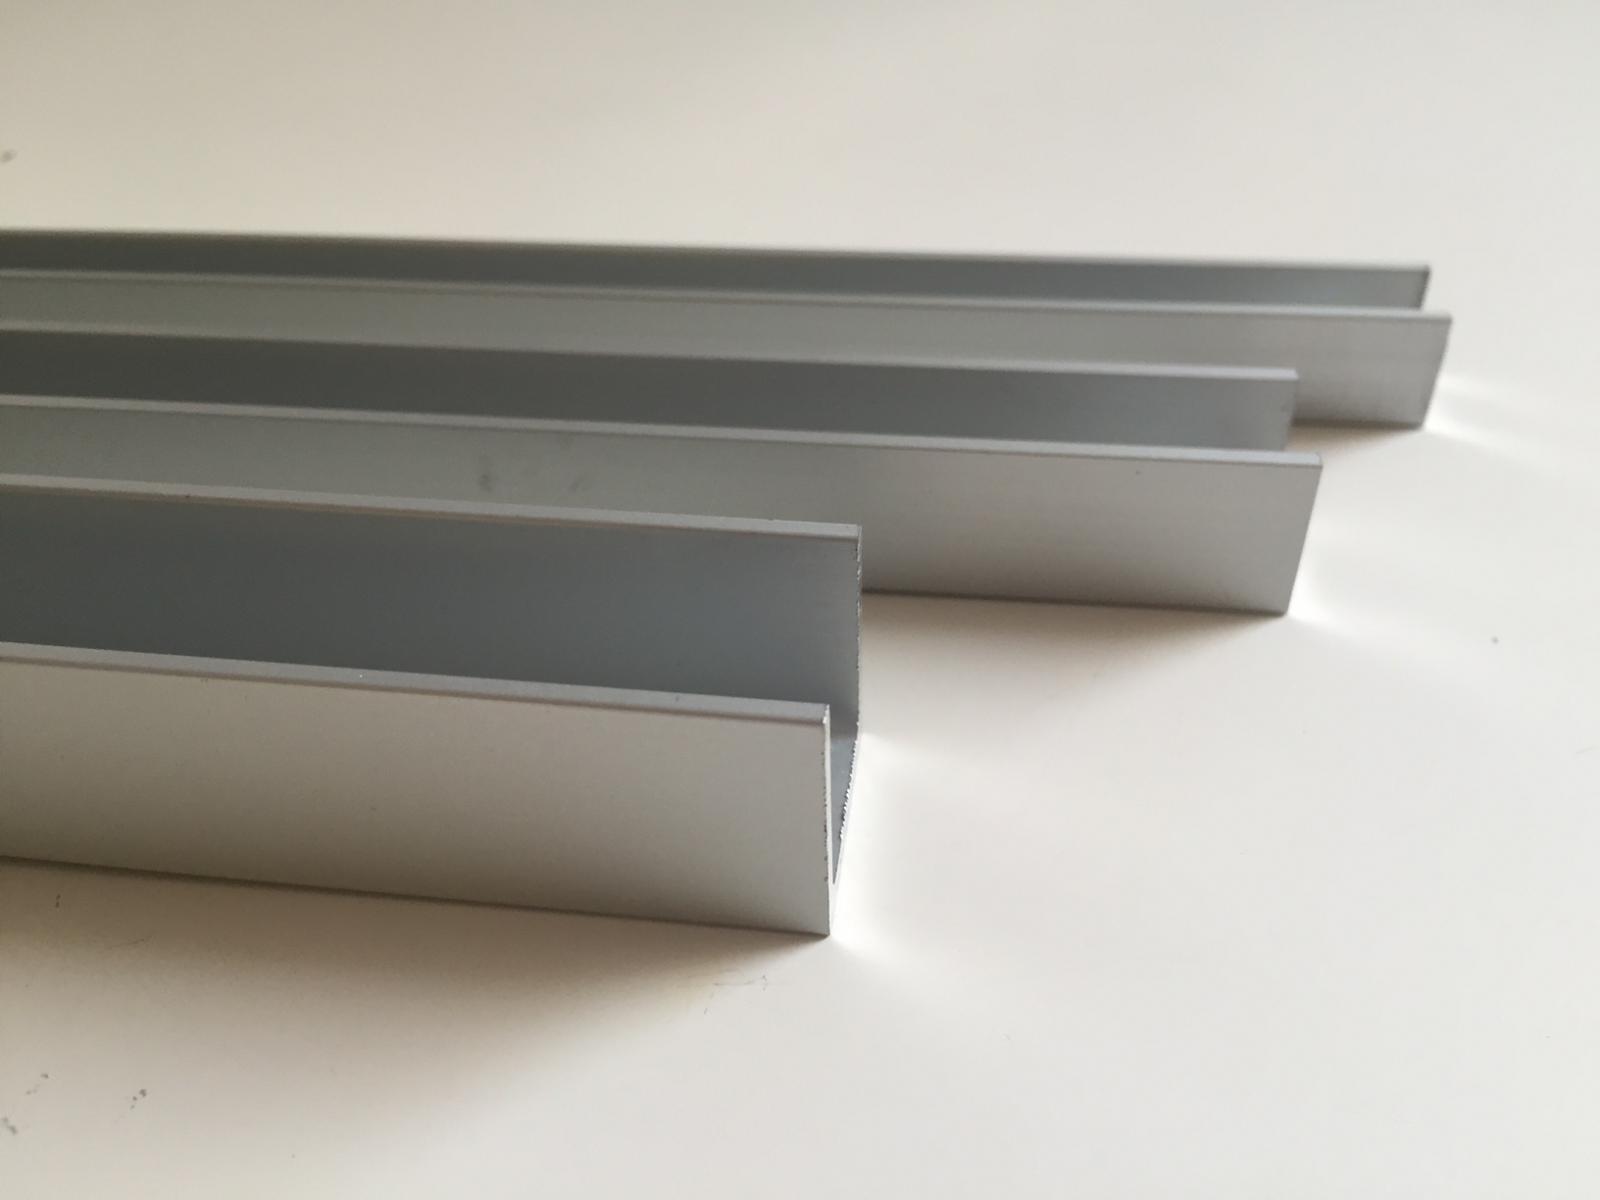 aluminium u kanal profil eloxiert verschiedene gr en ebay. Black Bedroom Furniture Sets. Home Design Ideas